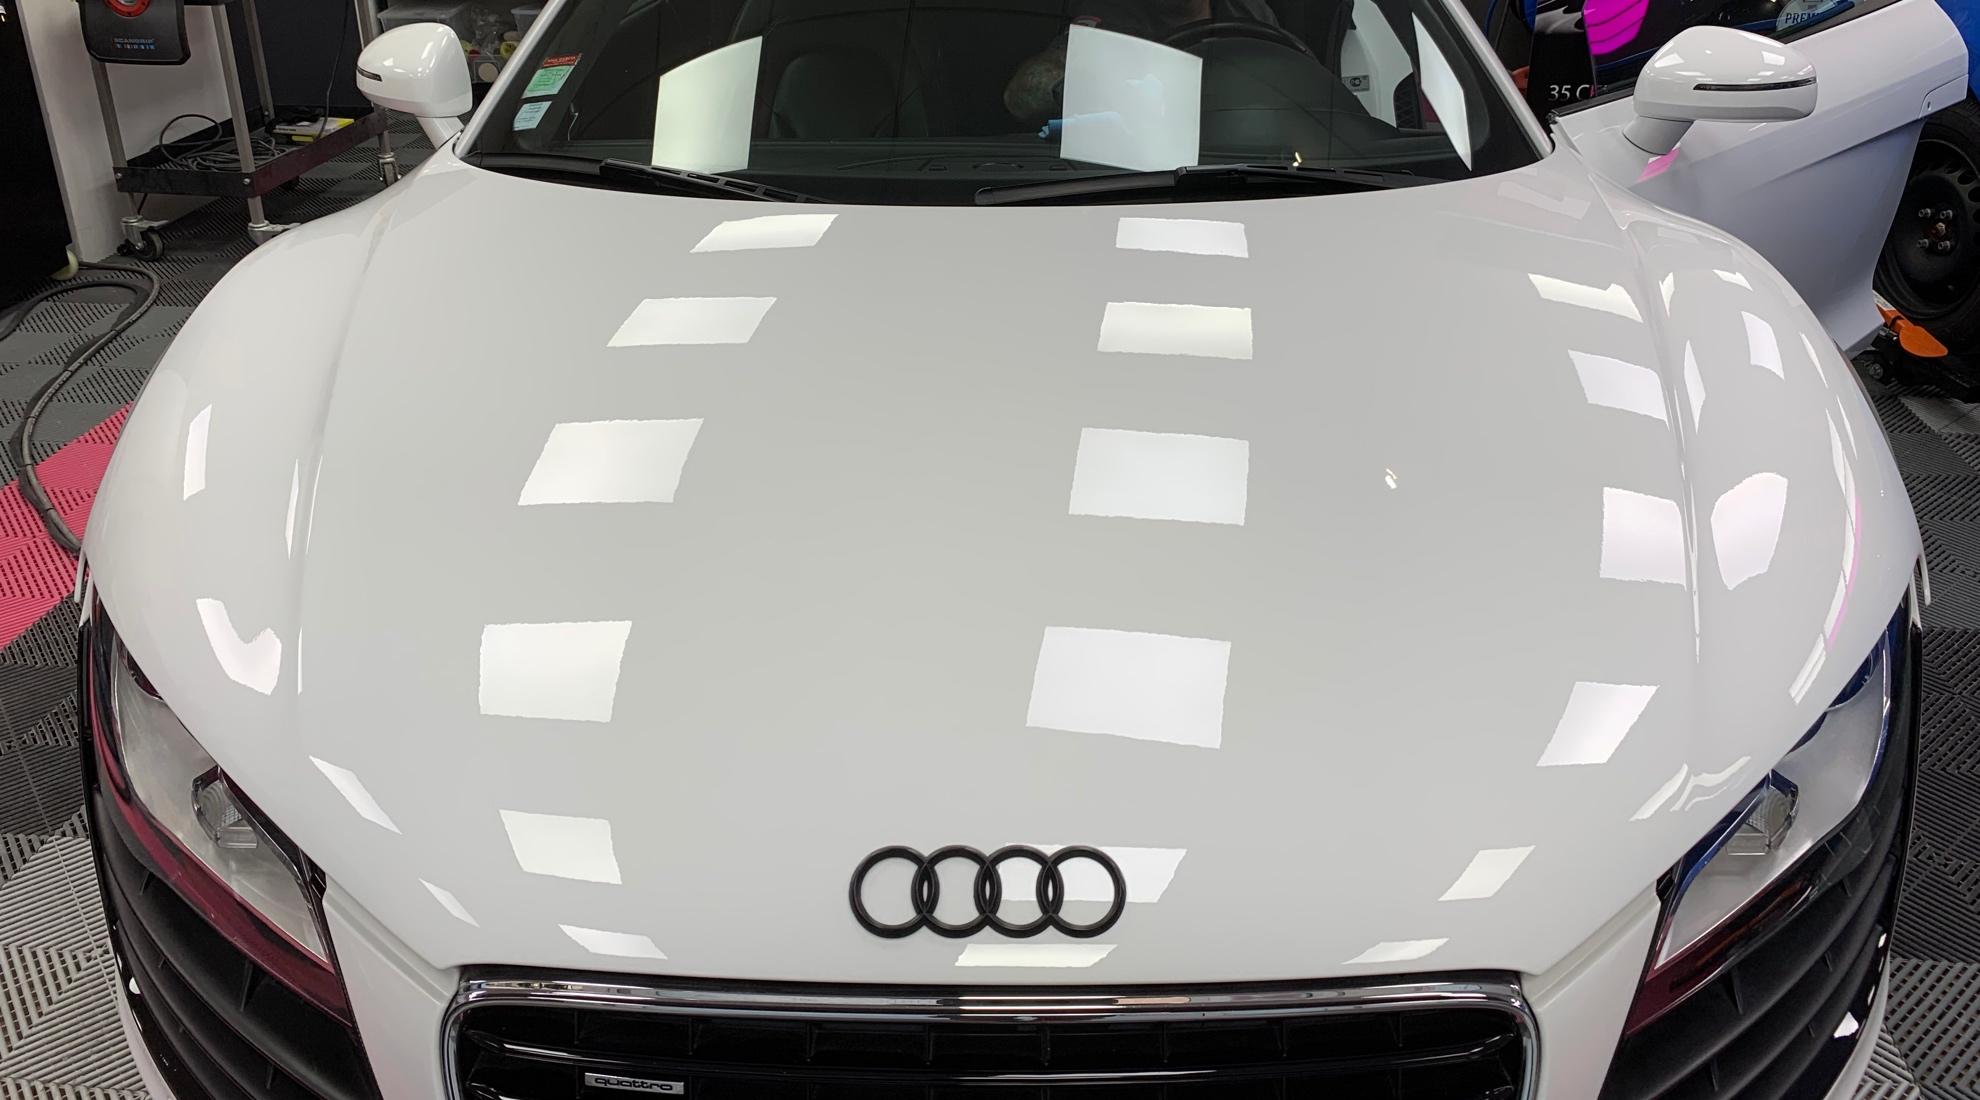 Audi_R8_blanc_polissage-carrosserie_face_avant